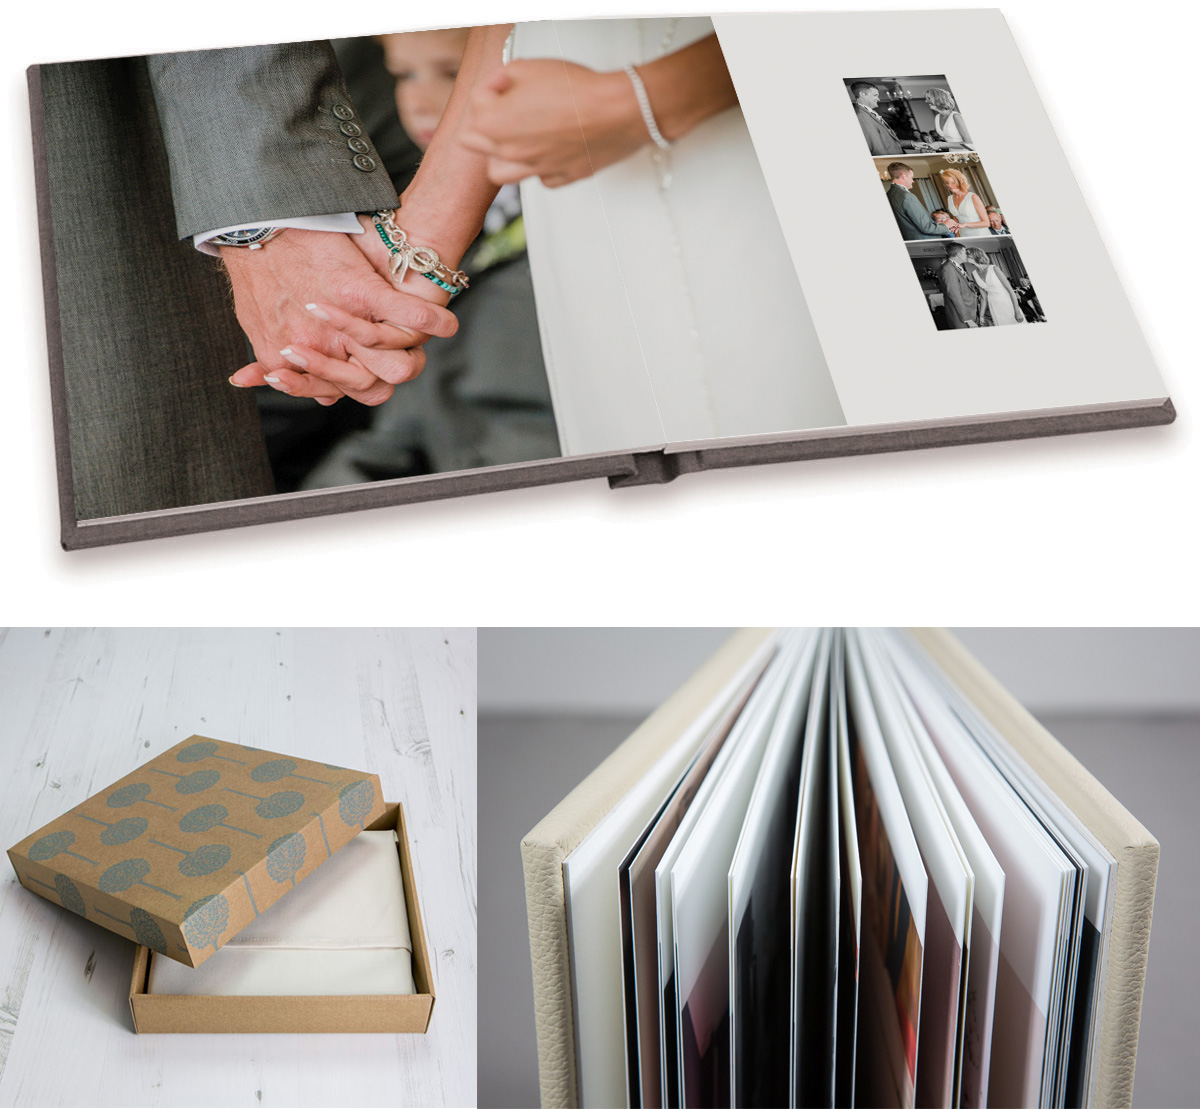 lisa lee photography christchurch dorset - albums